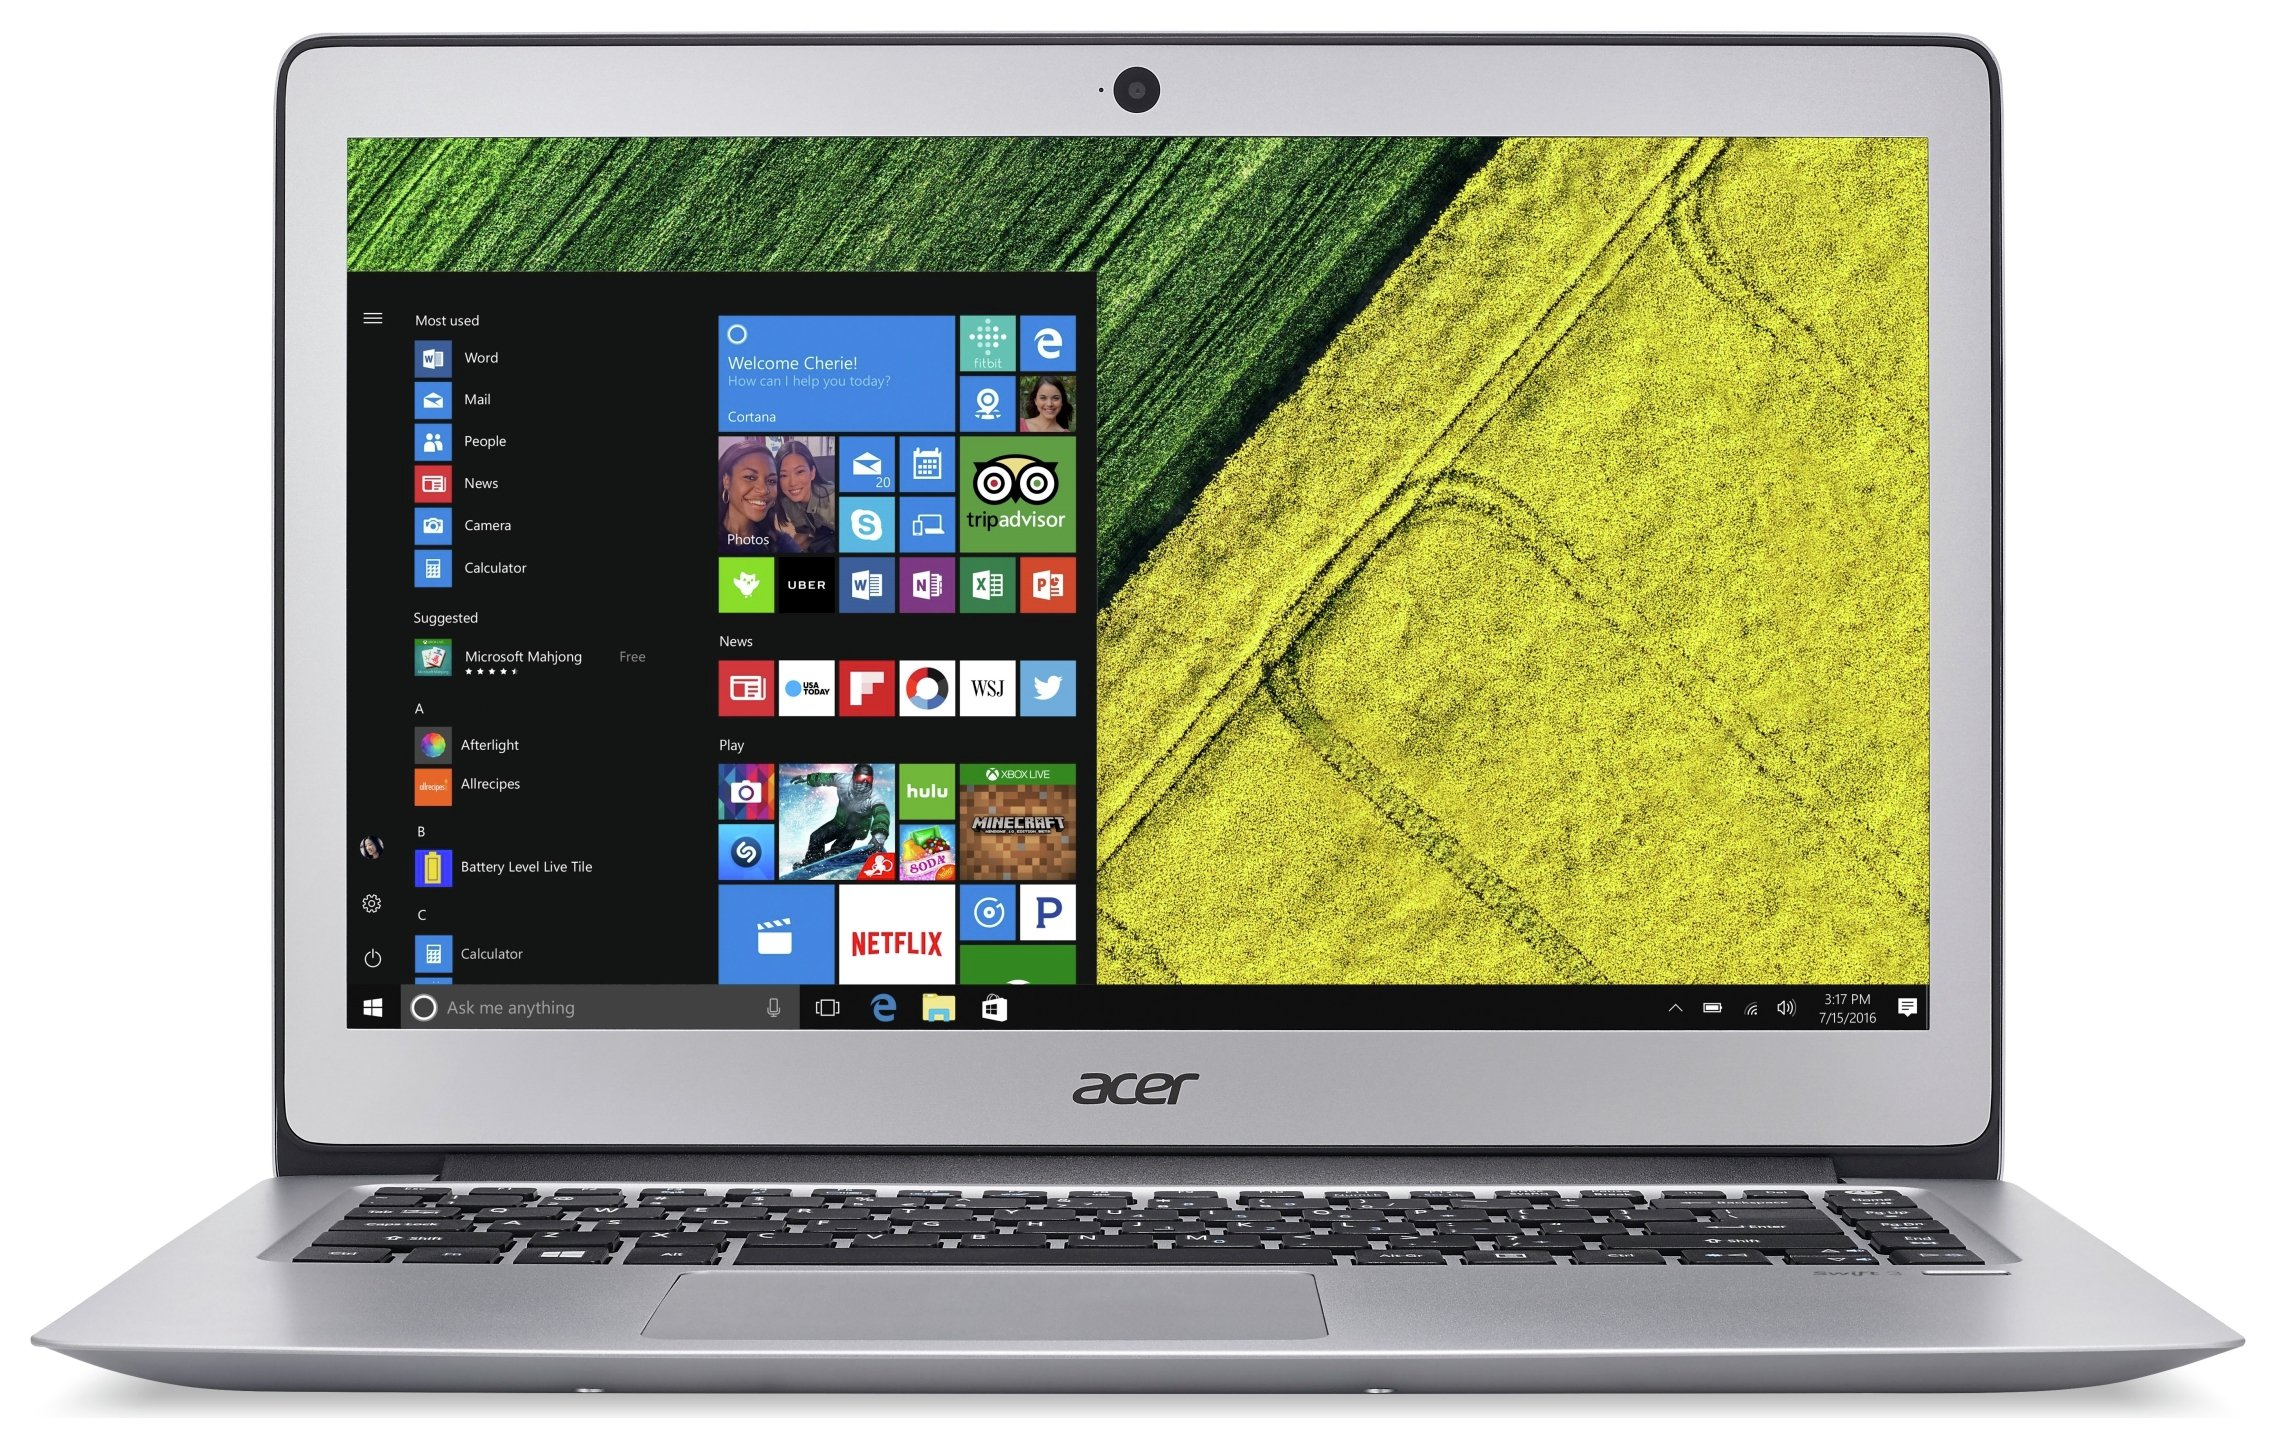 Acer Swift 3 14 Inch Ci3 8GB 128GB Laptop Silver